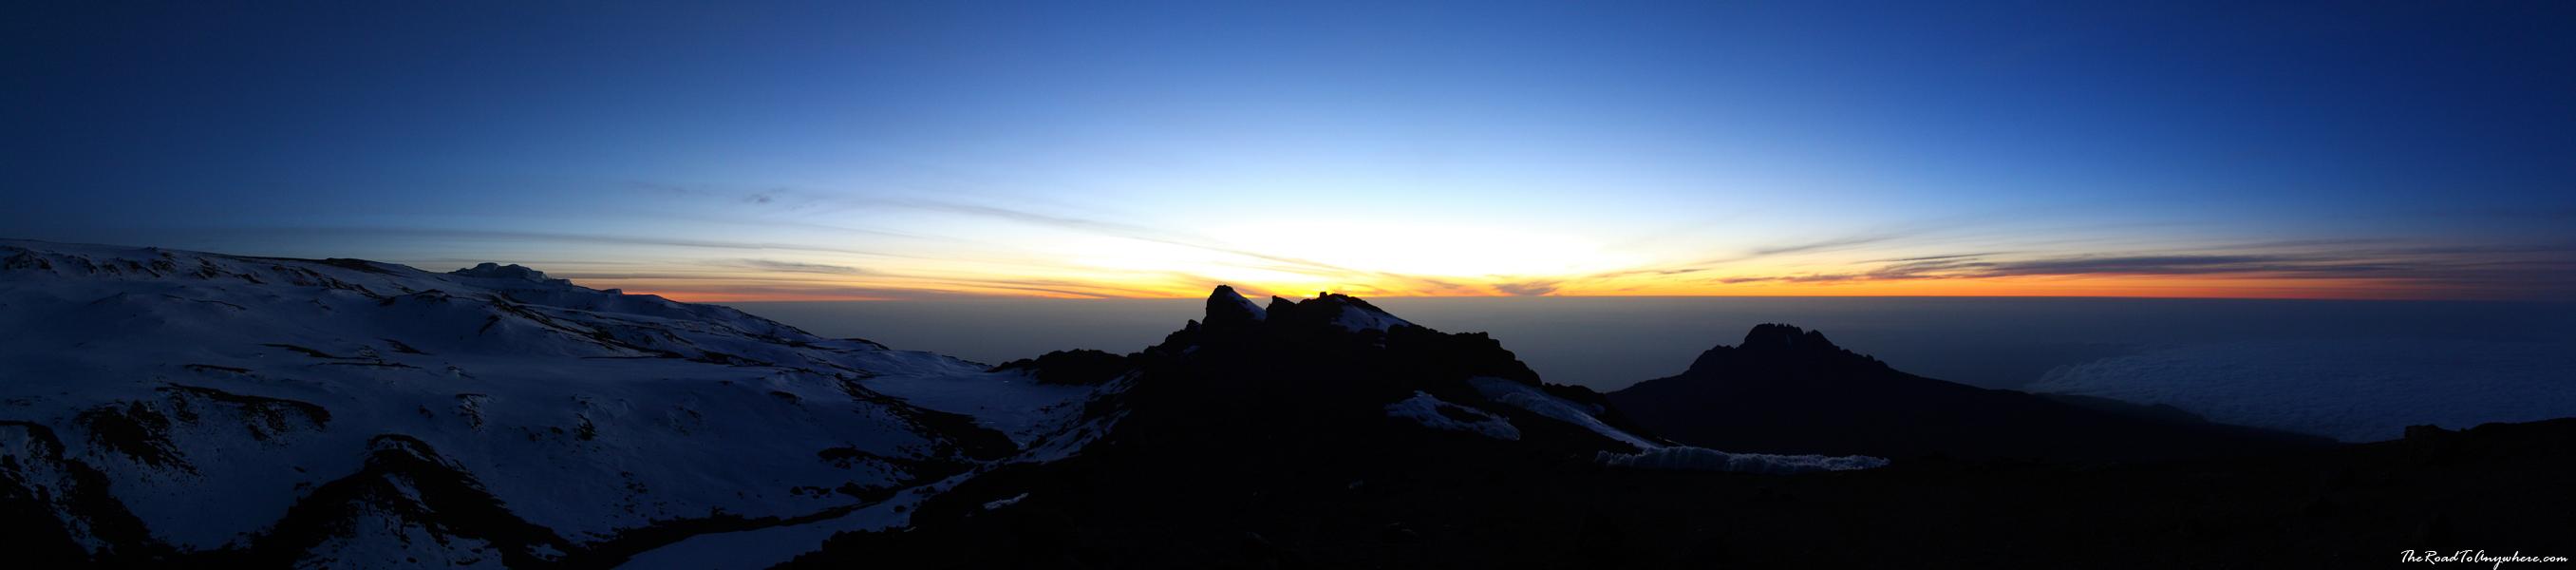 Panorama of the sunrise from the summit of Mount Kilimanjaro, Tanzania